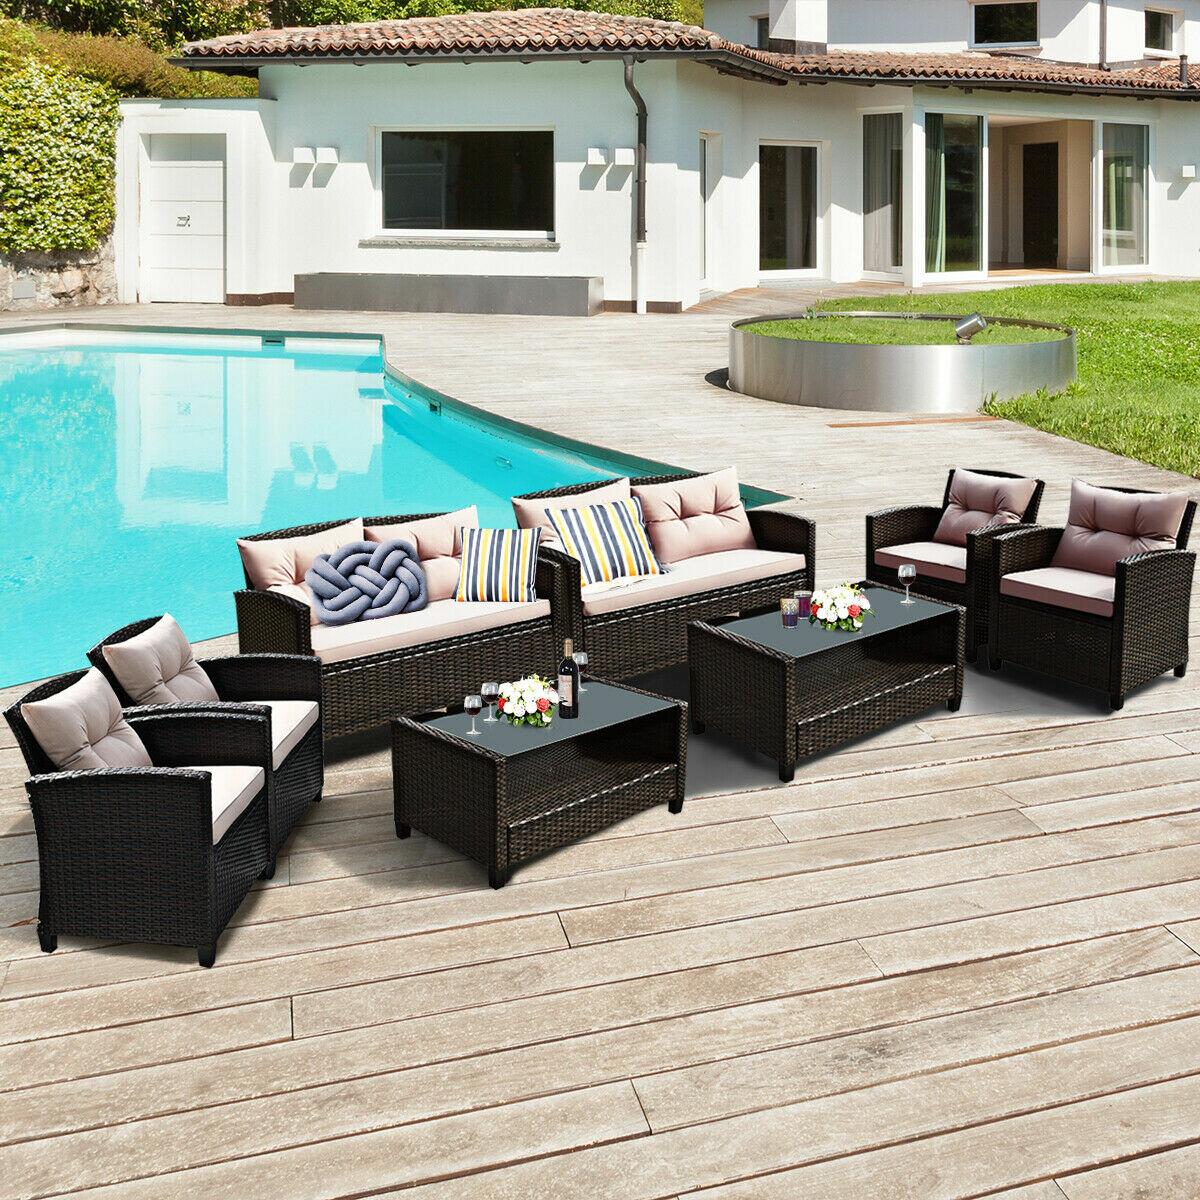 Ebern Designs Goberman 8 Piece Rattan Sofa Seating Group With Cushions Reviews Wayfair